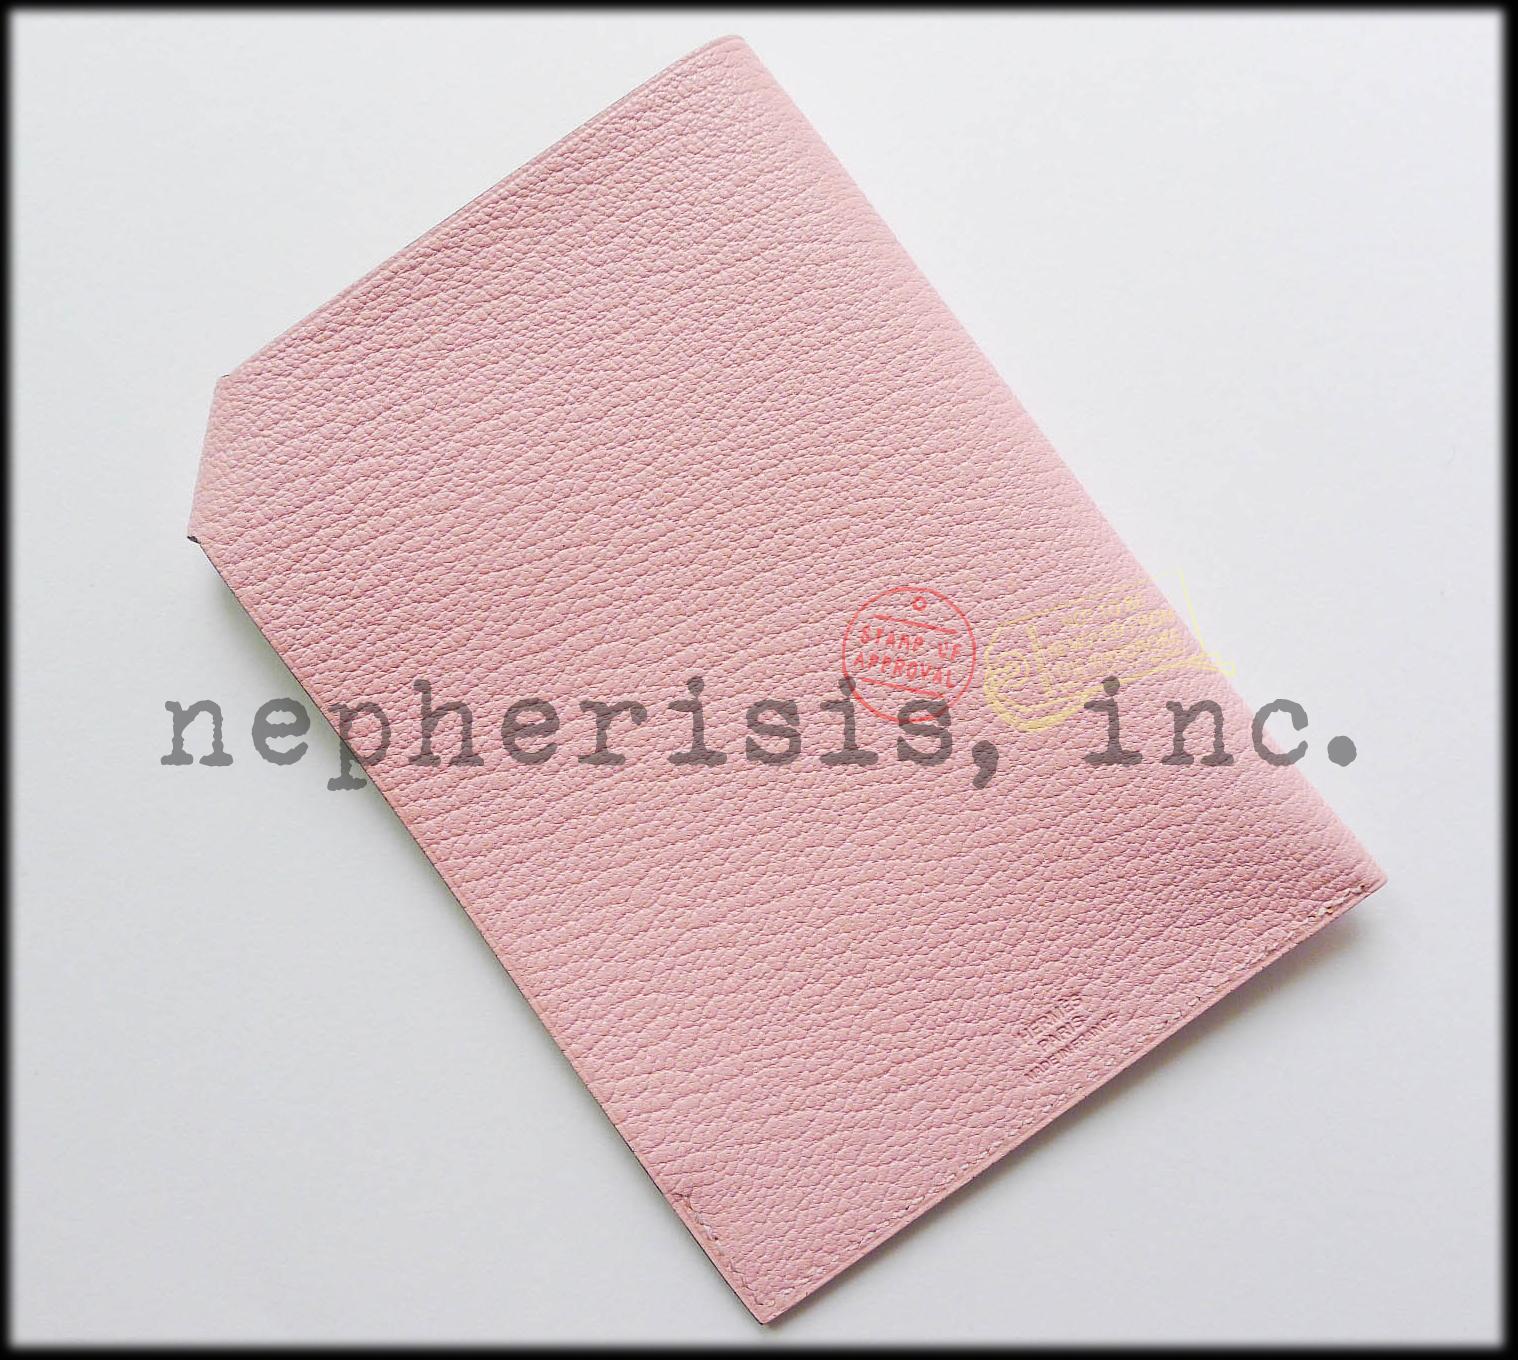 AUTH BNIB Hermes TARMAC PM Passport Holder or Cover in Pink Chevre ROSE SAKURA image 2